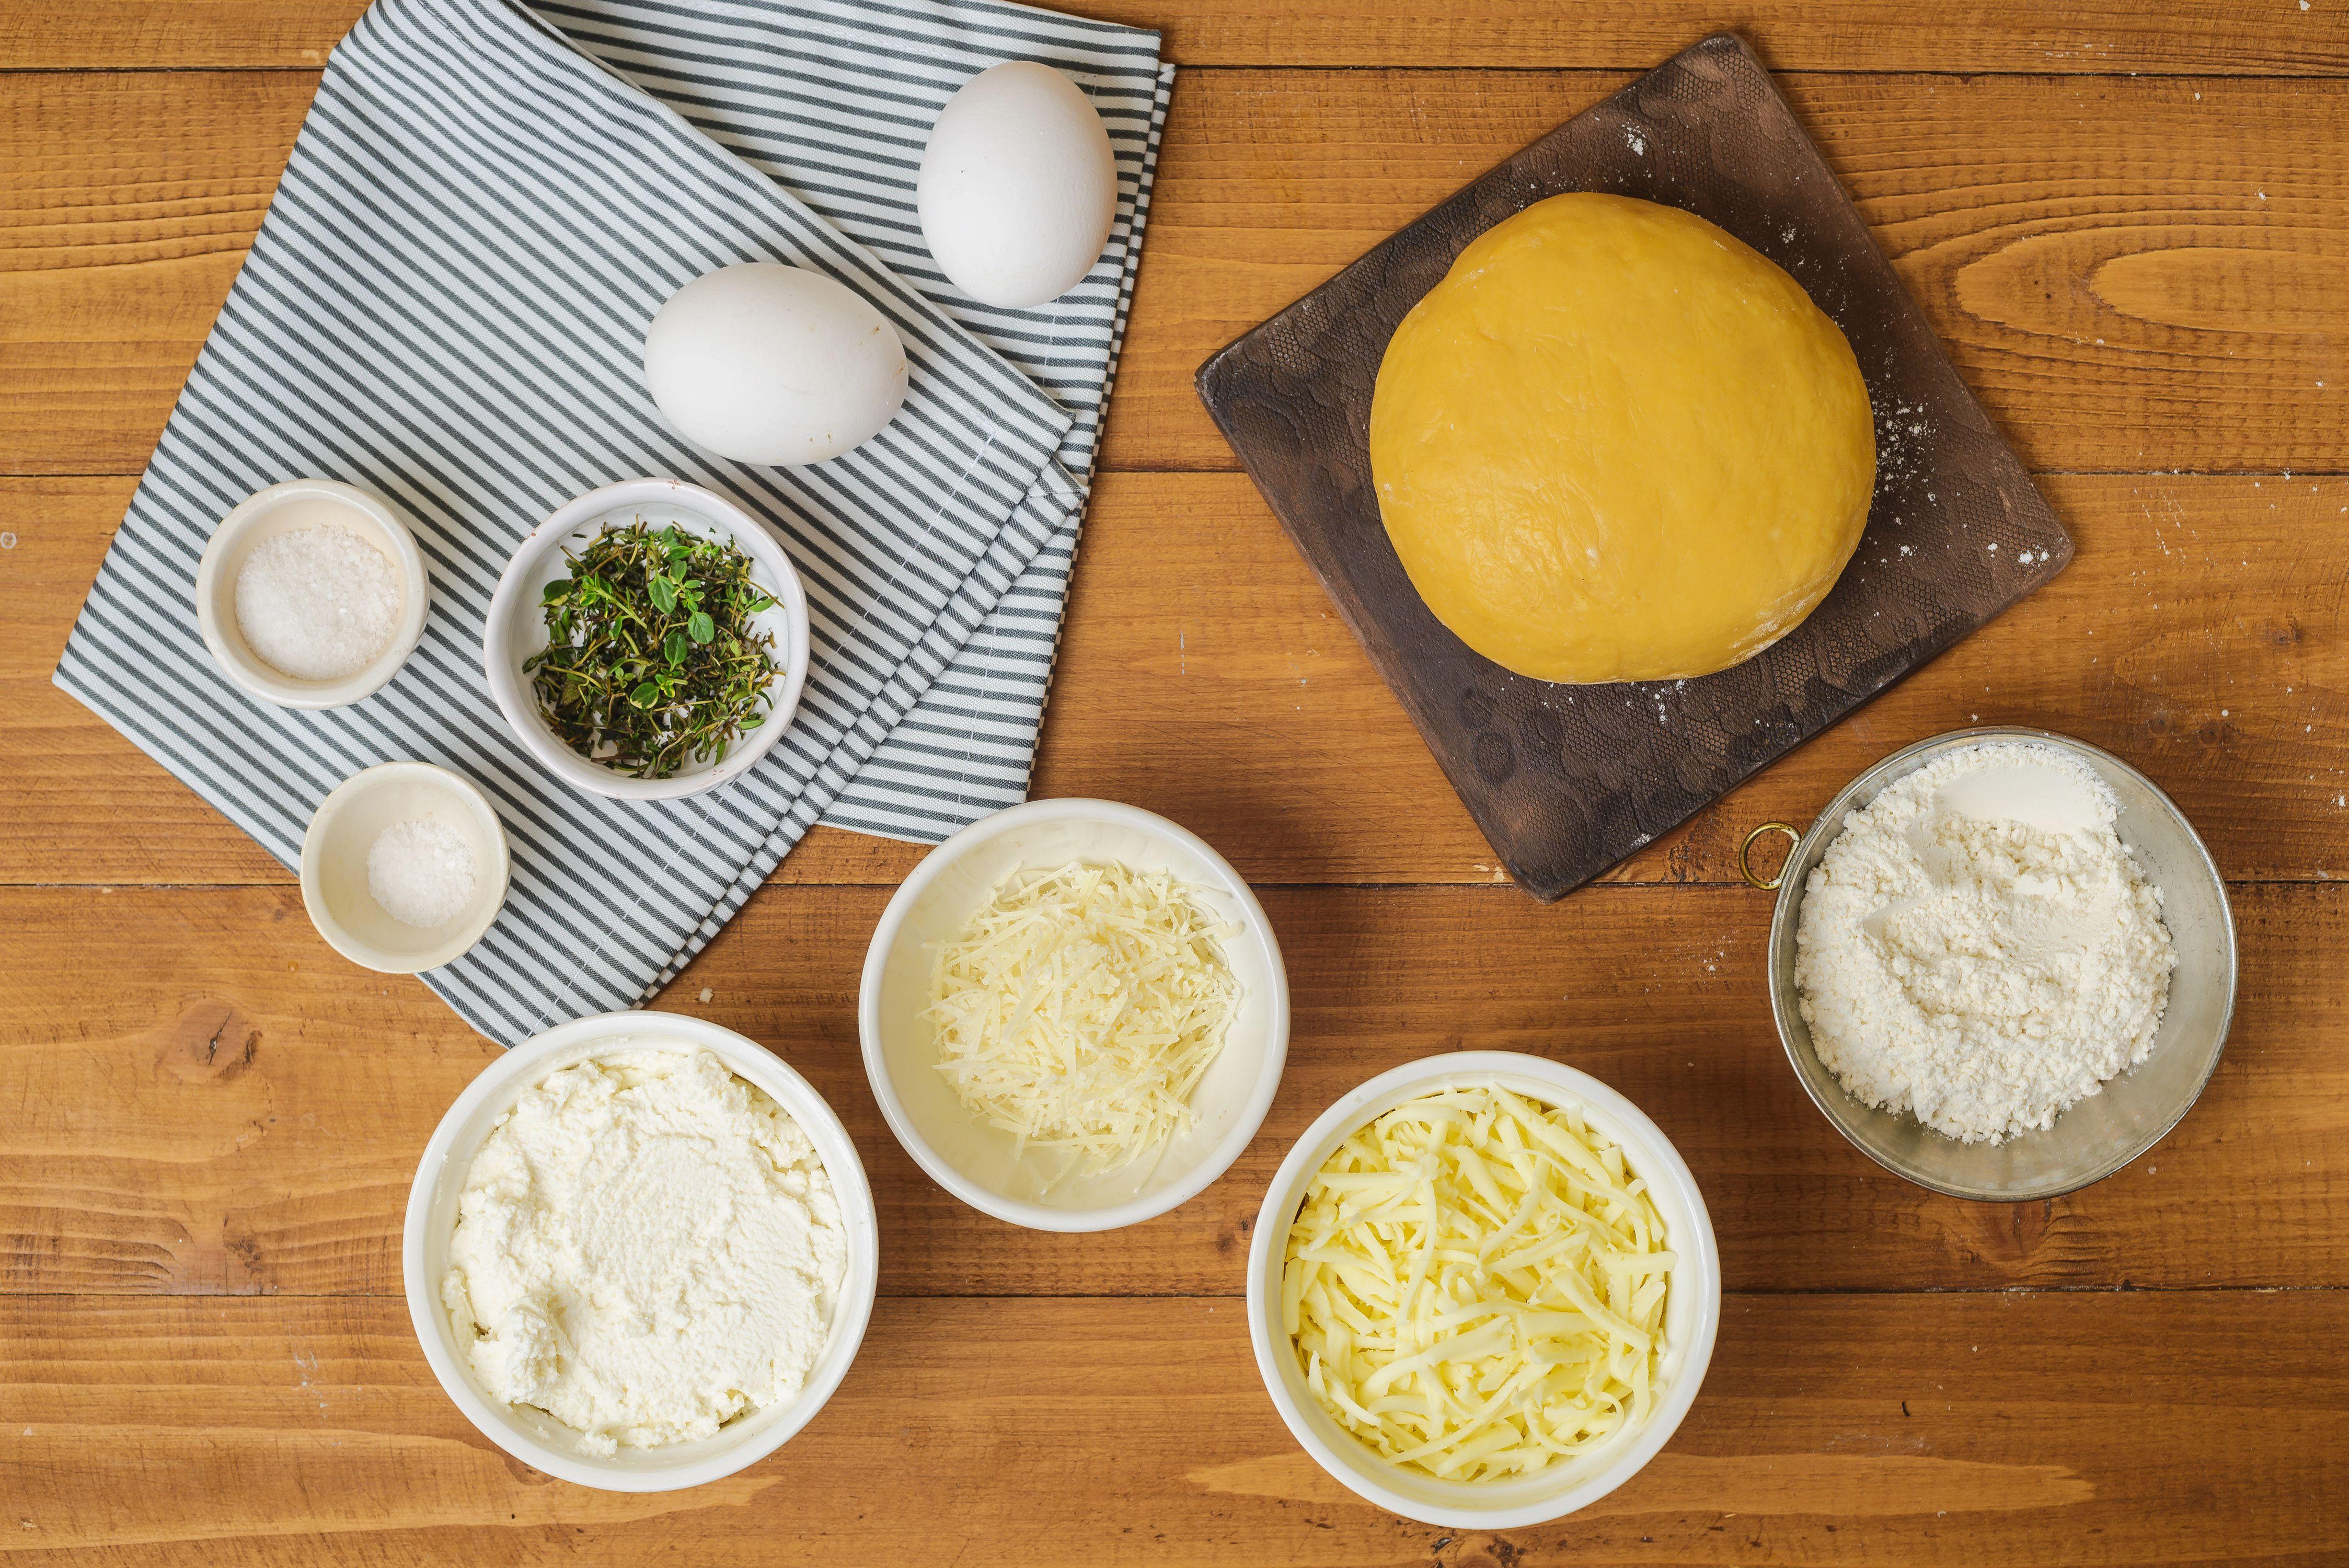 Ingredients for ravioli